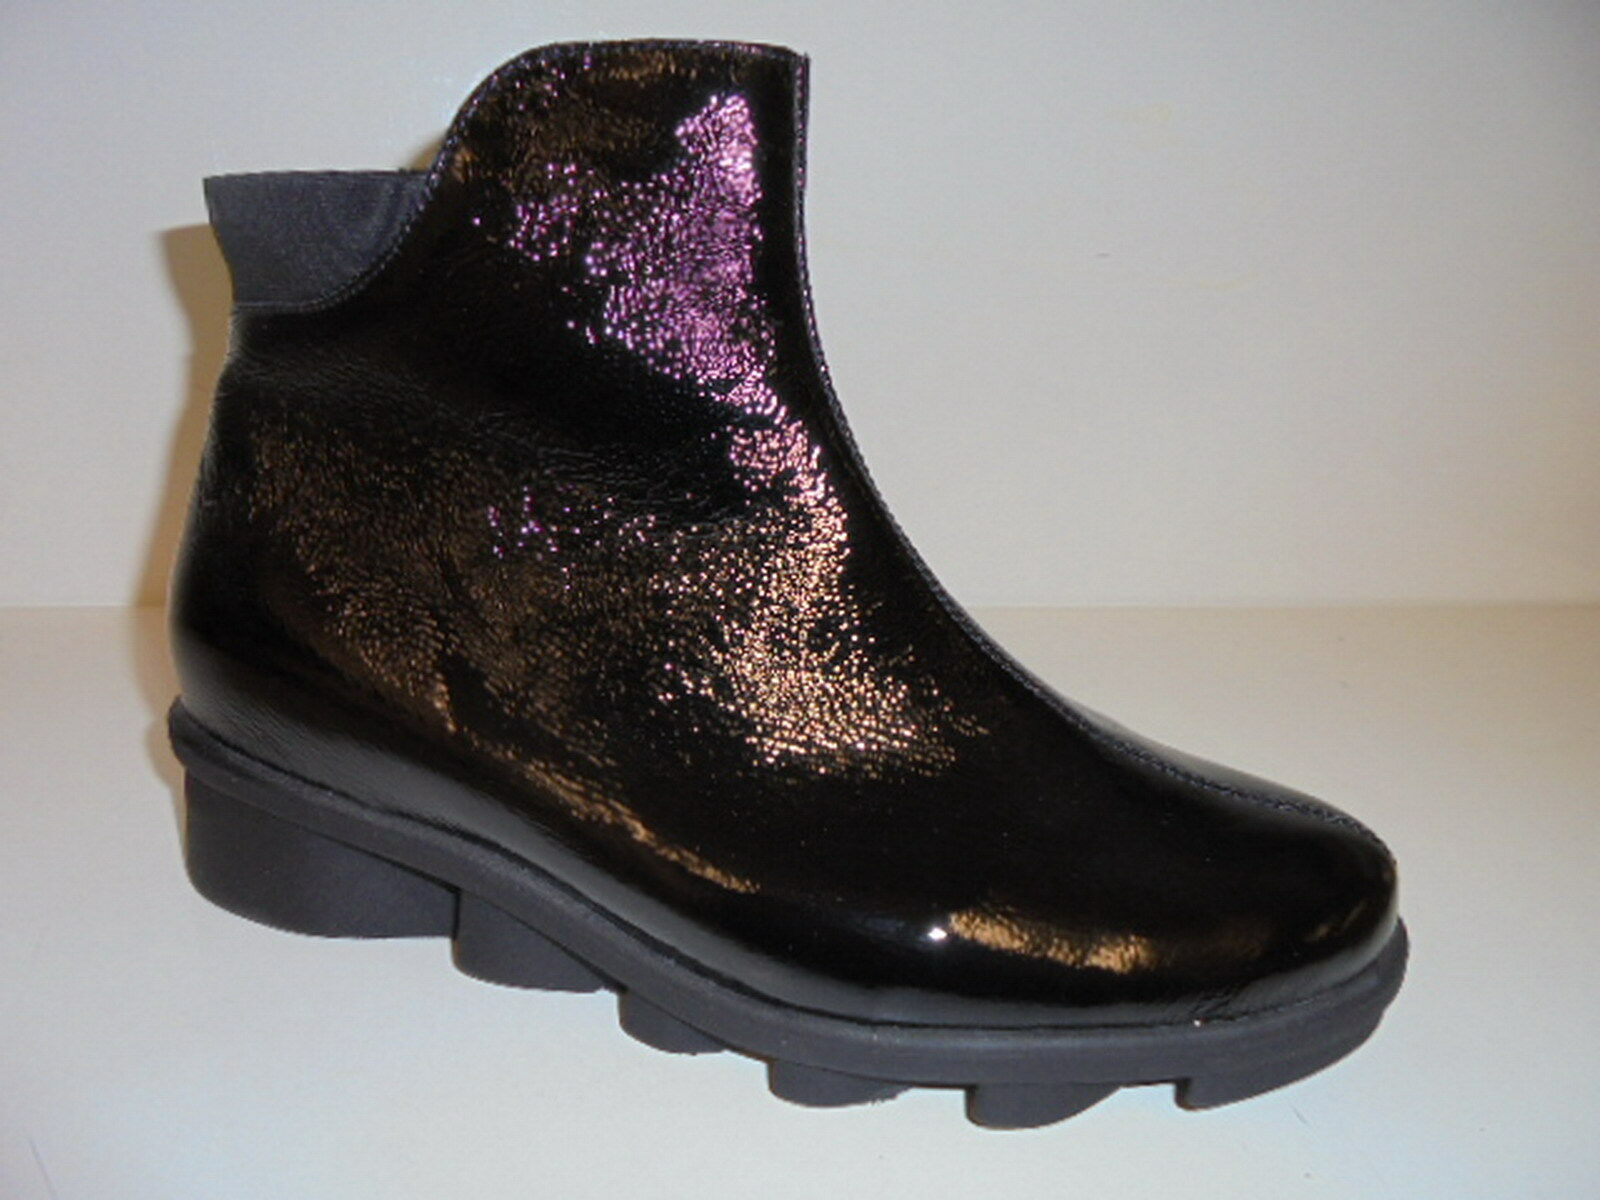 333803 Waldläufer Damenschuhe Boots Lackleder schwarz UK 5 Gr. 38